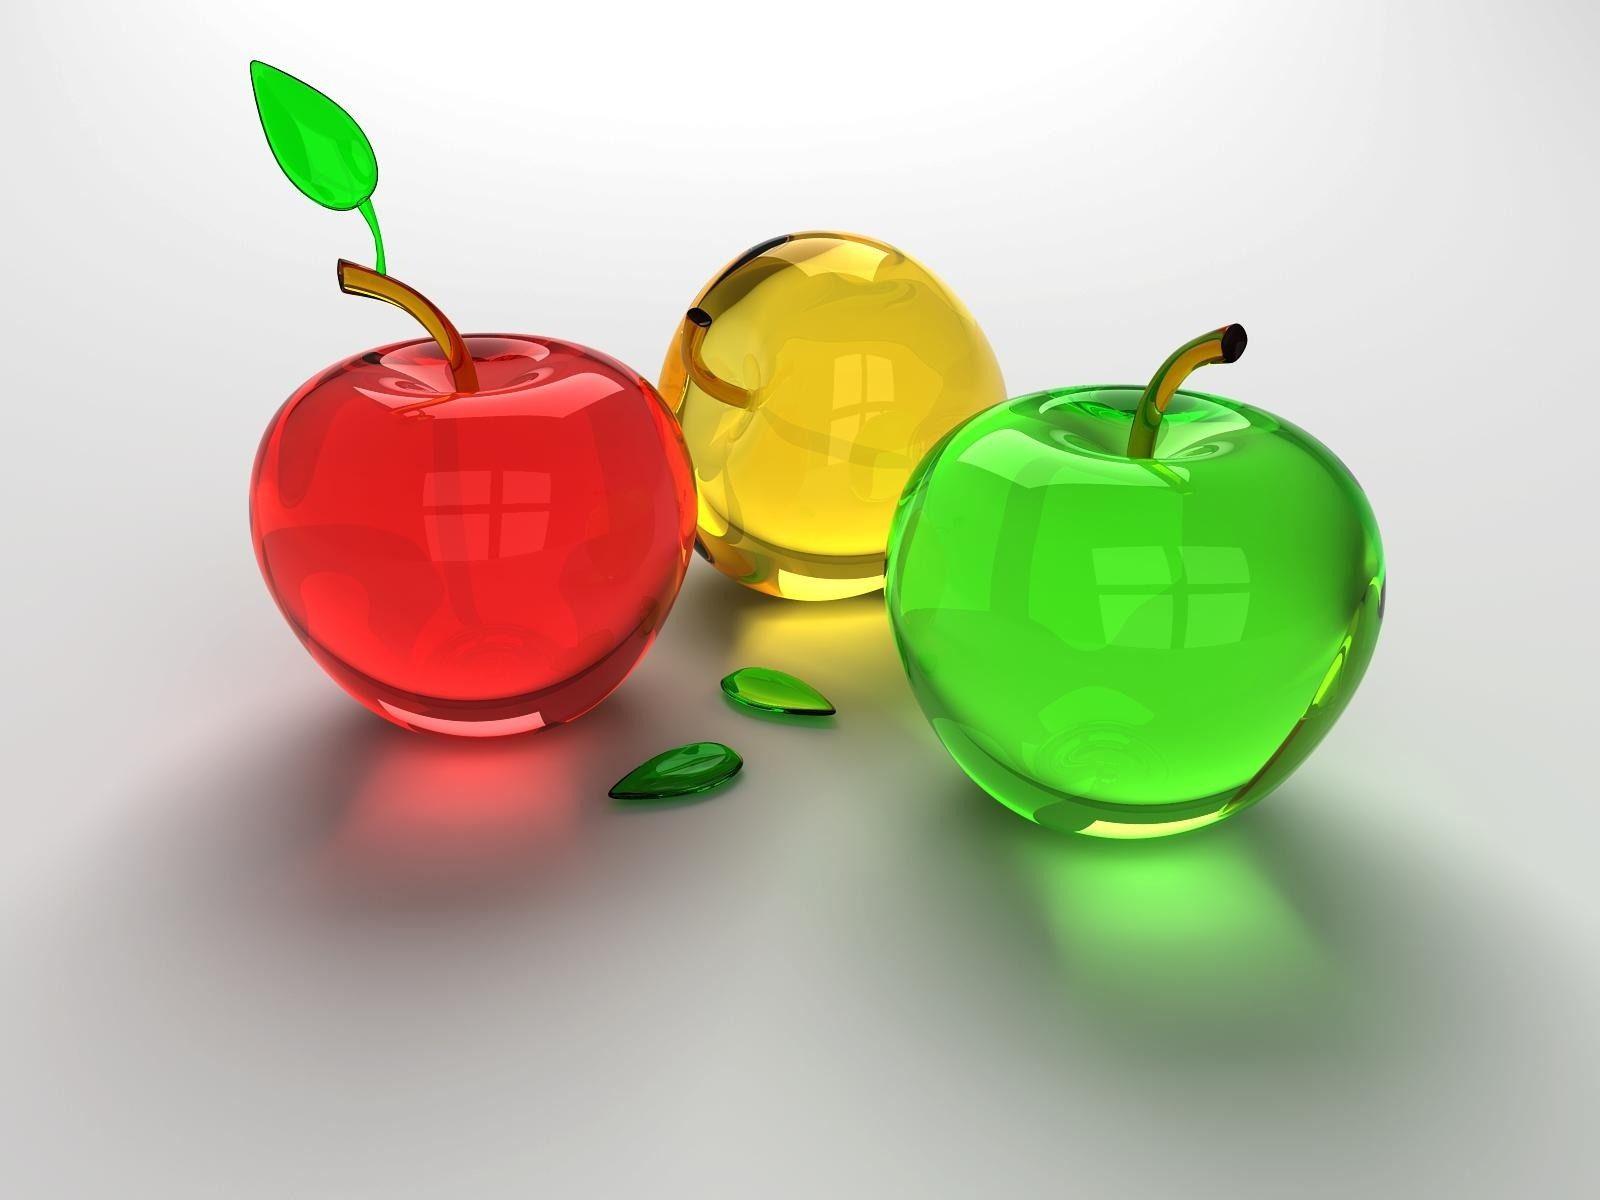 Dimensional 3D Glass Apples desktop wallpaper nr 54441 by 1600x1200